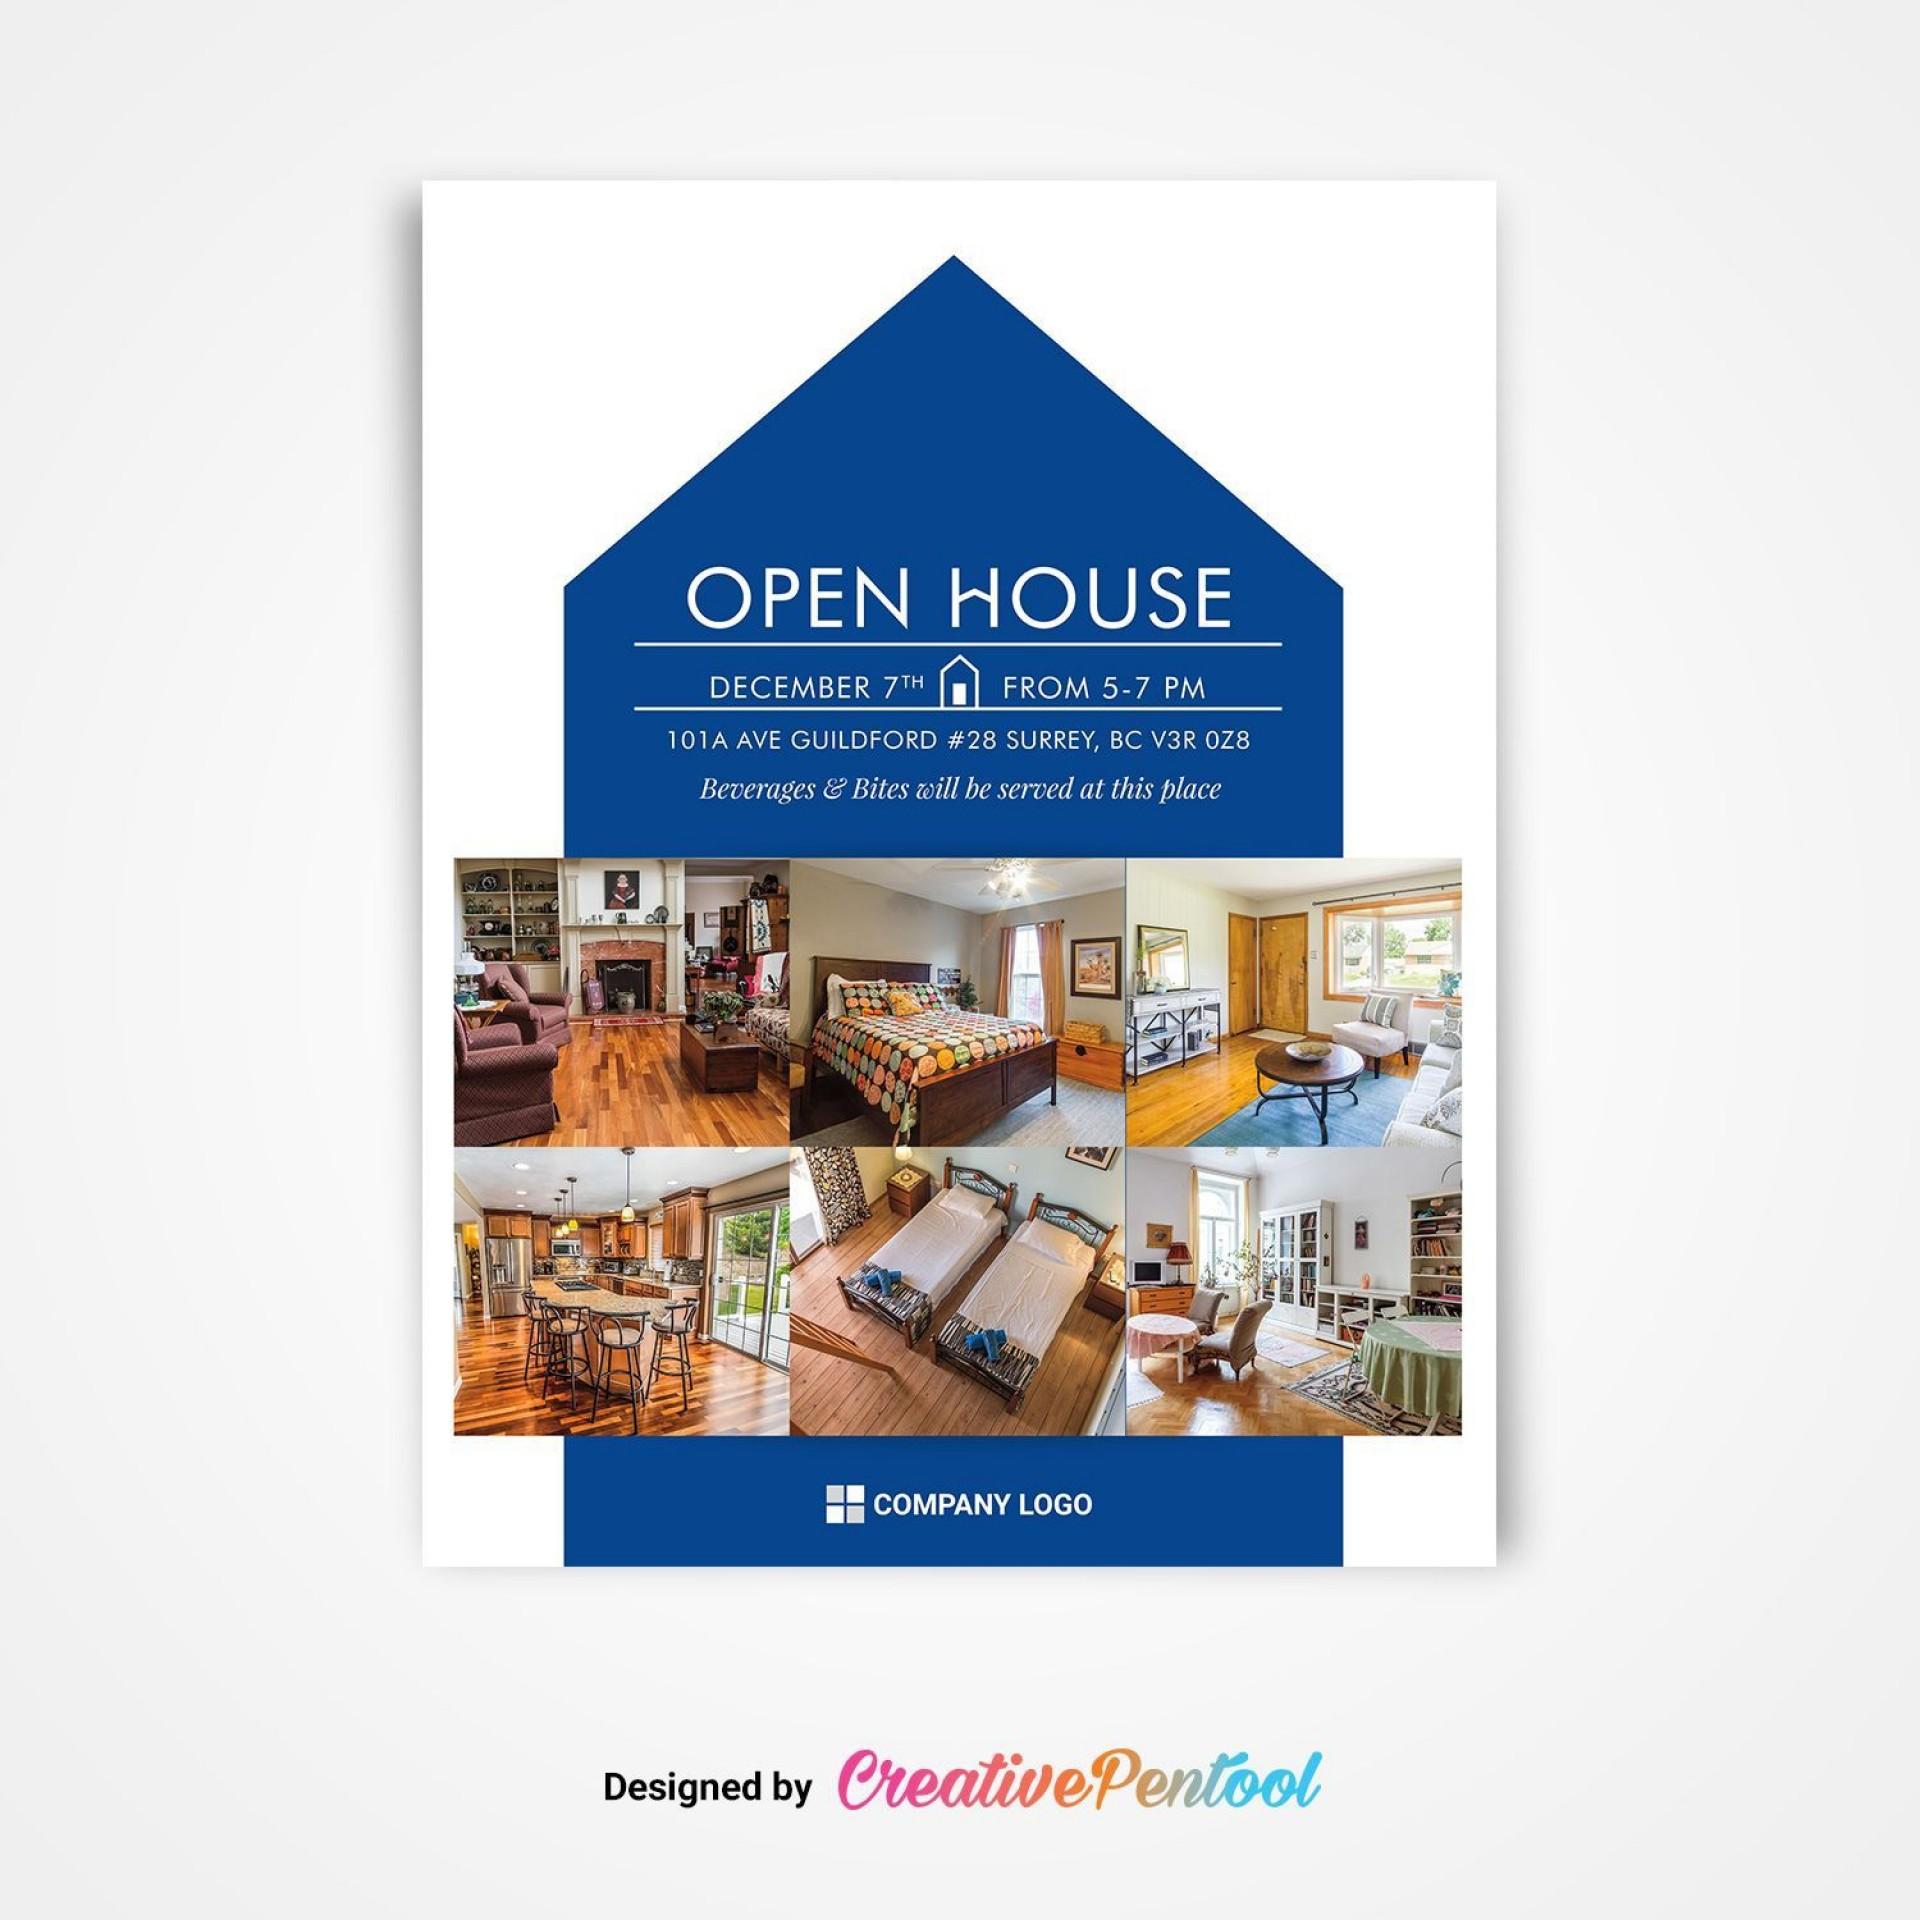 004 Dreaded Open House Flyer Template Free Highest Clarity  Holiday Preschool School Microsoft1920